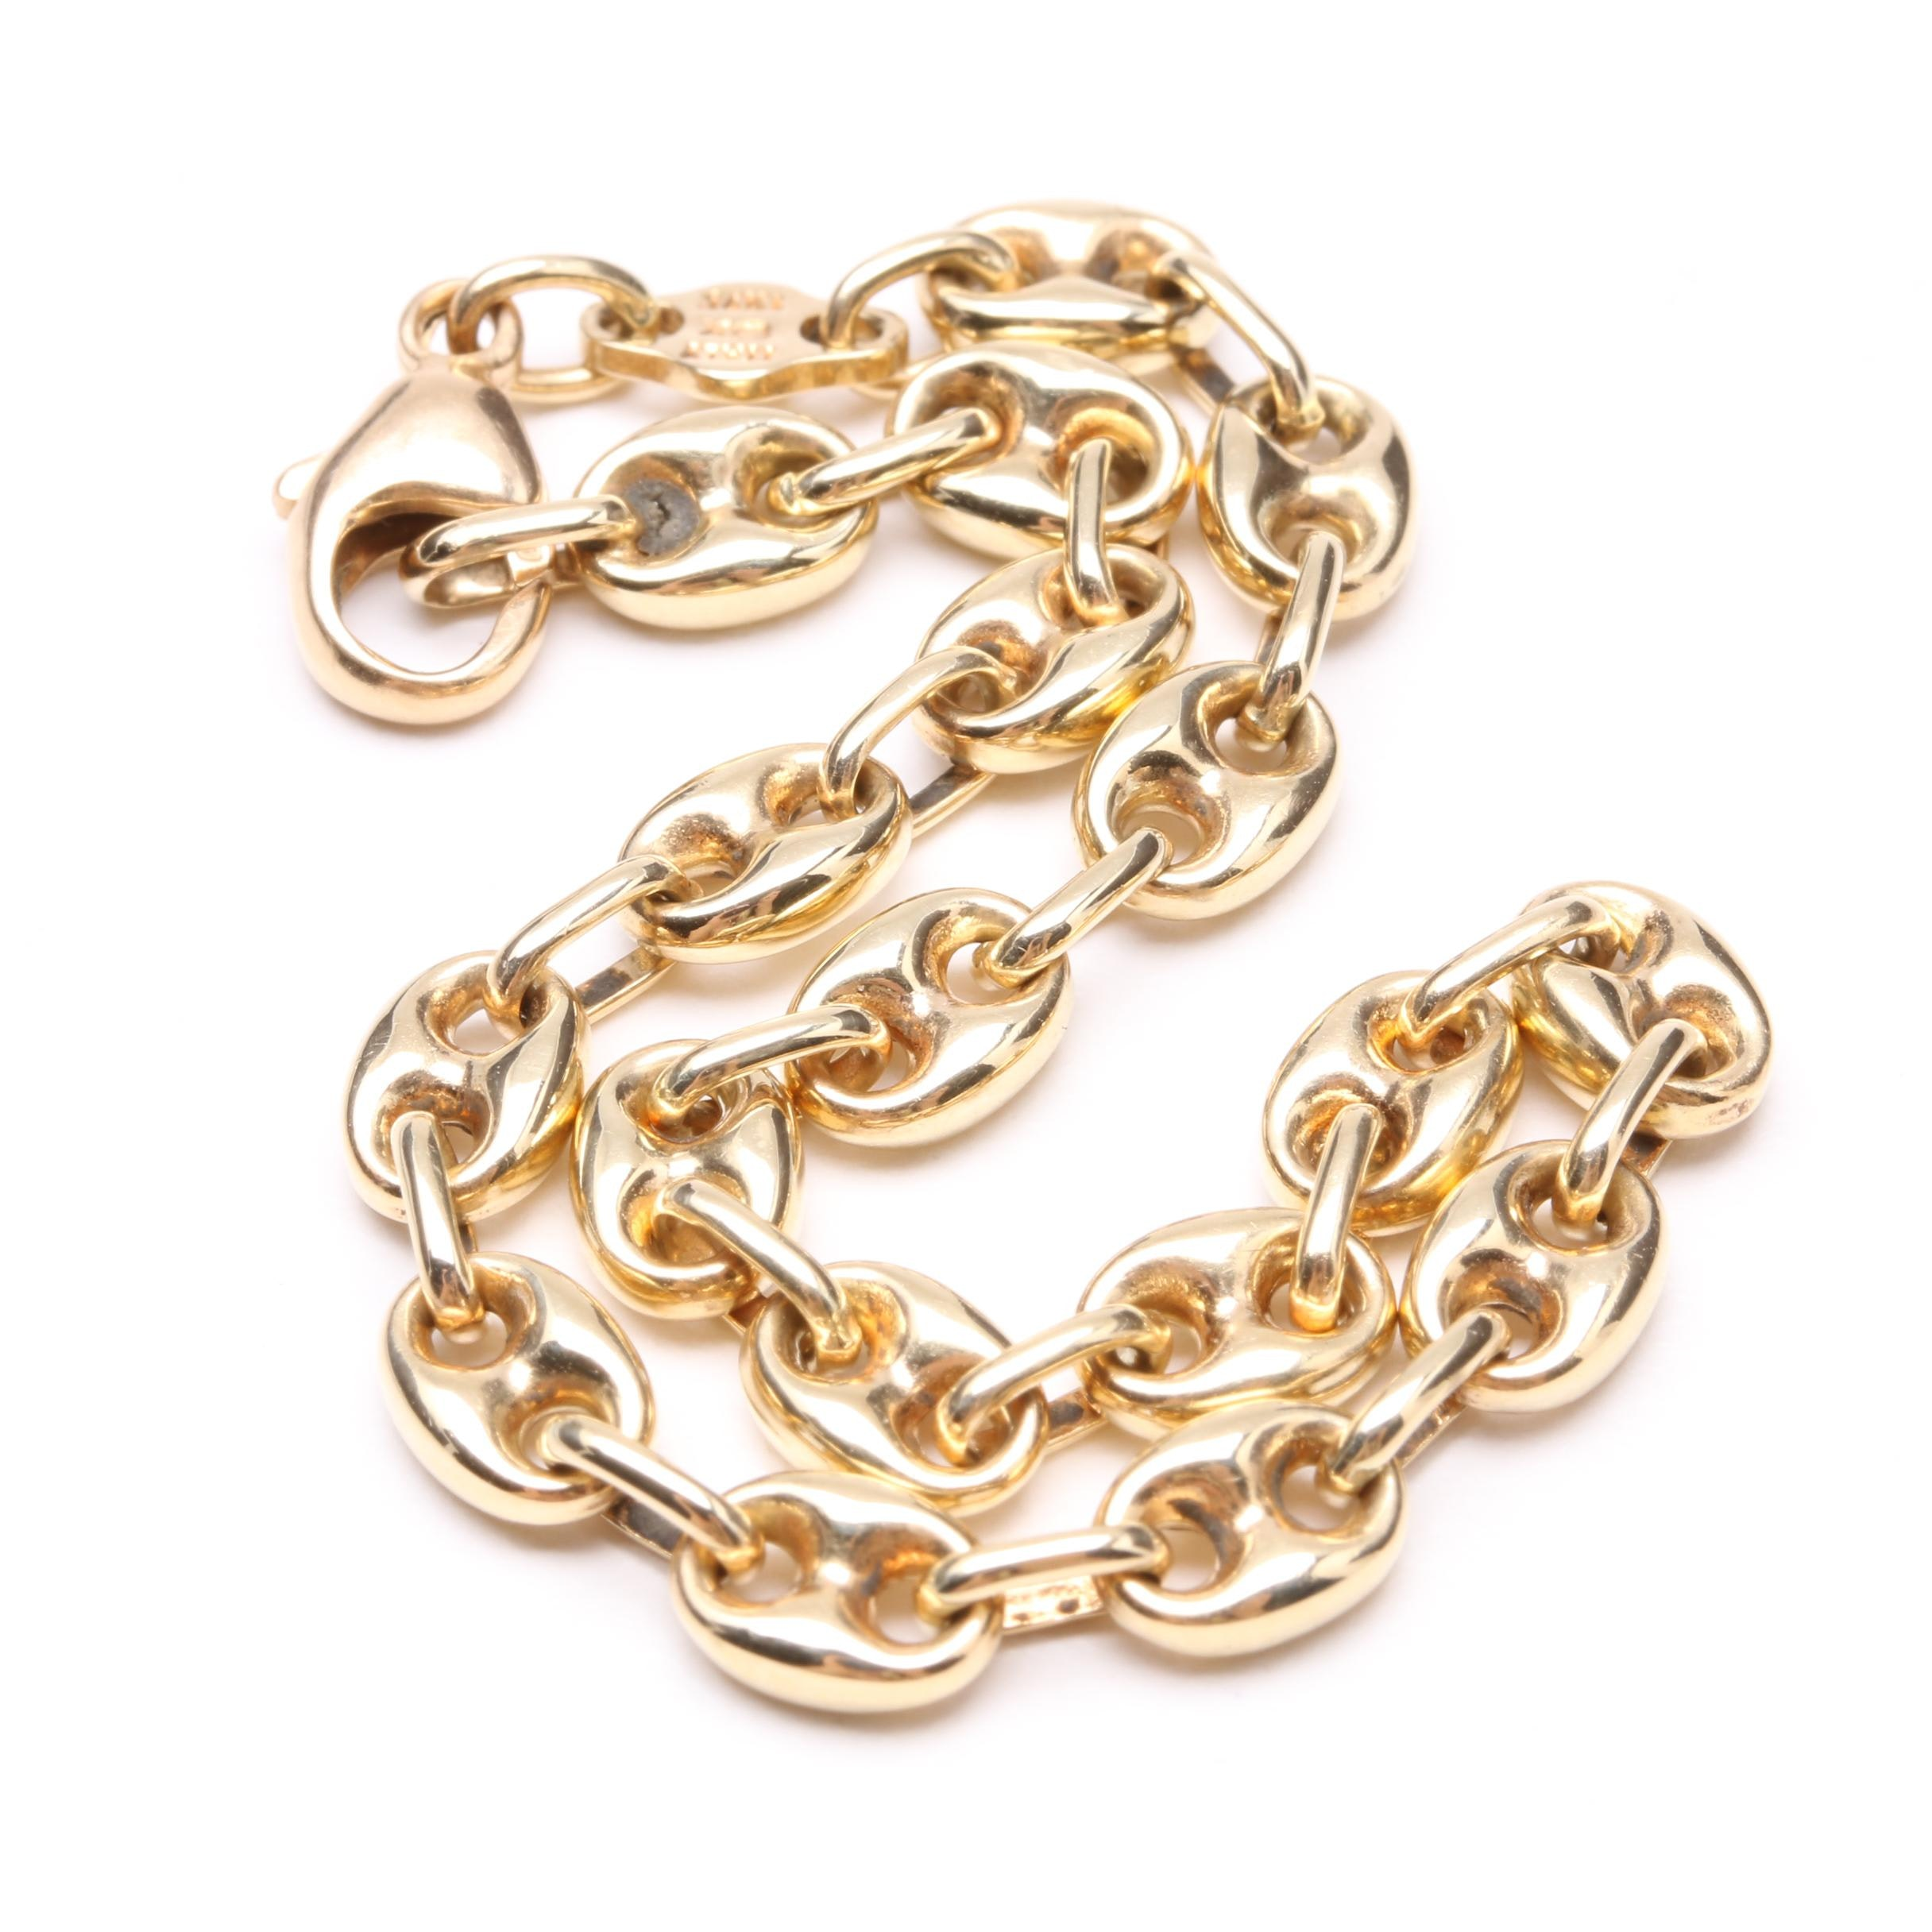 Italian 14K Yellow Gold Mariner Chain Bracelet